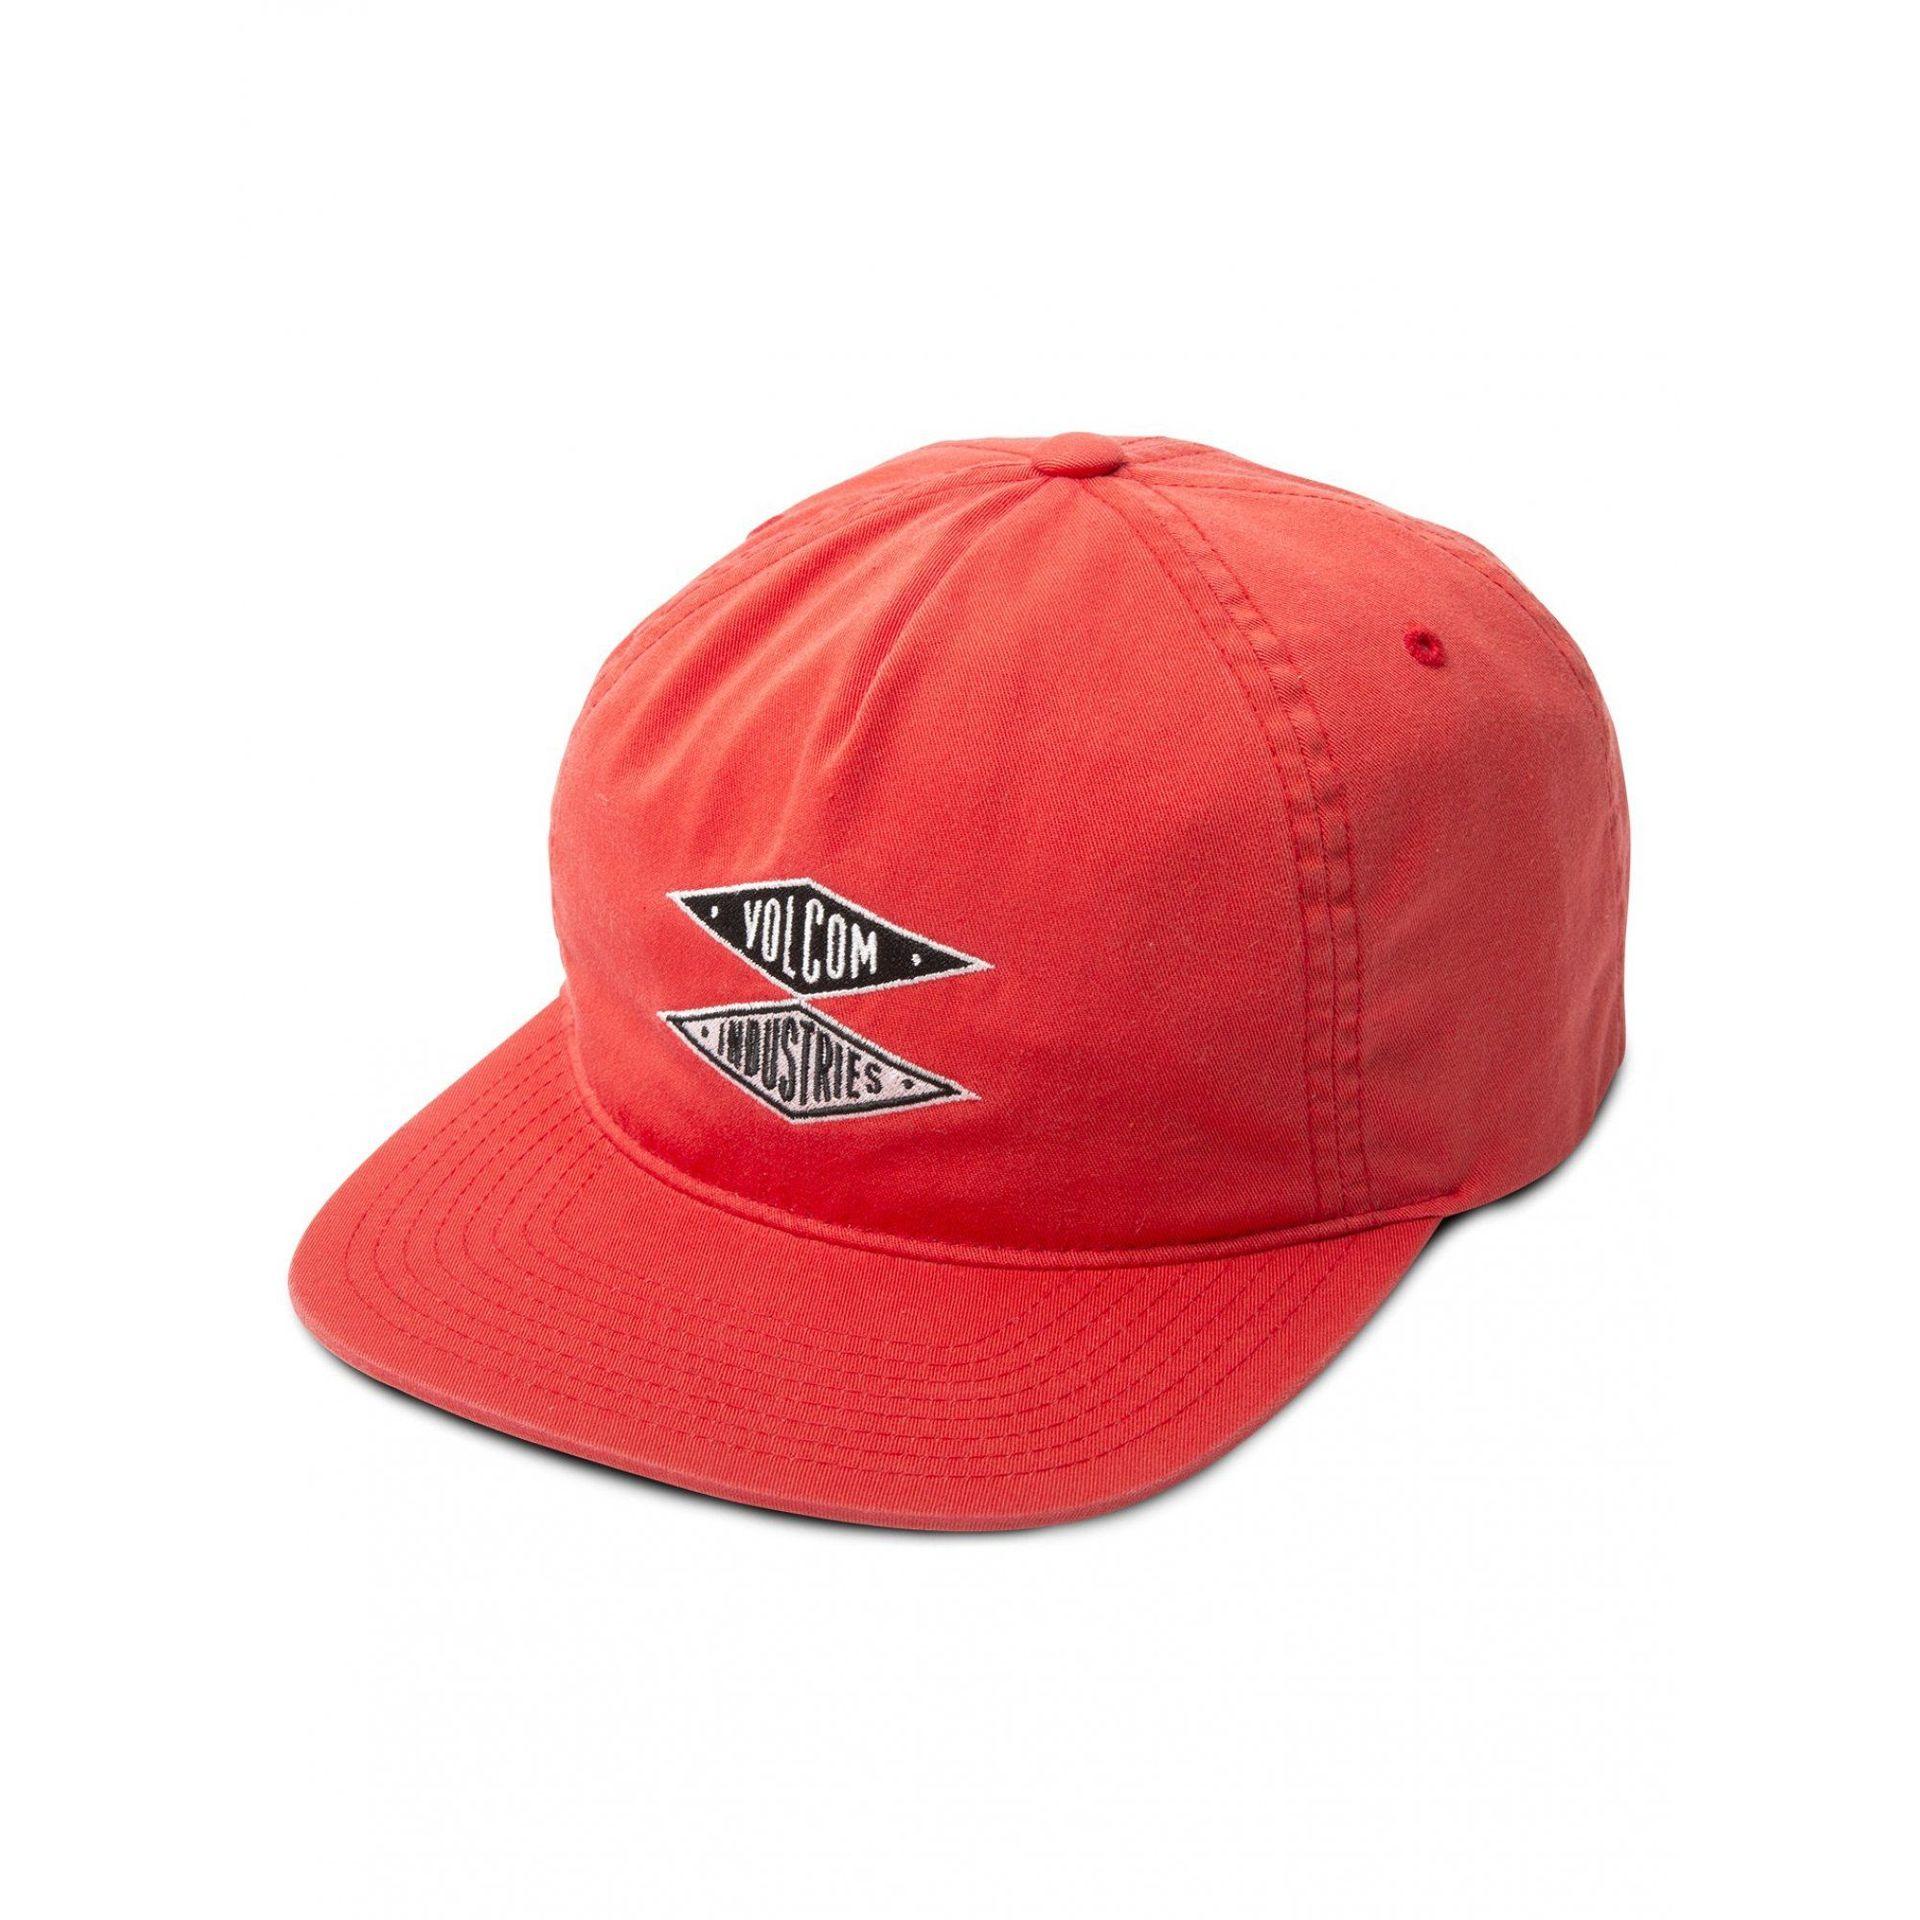 CZAPKA Z DASZKIEM VOLCOM V.I. CAP A5511950-BRIGHT RED